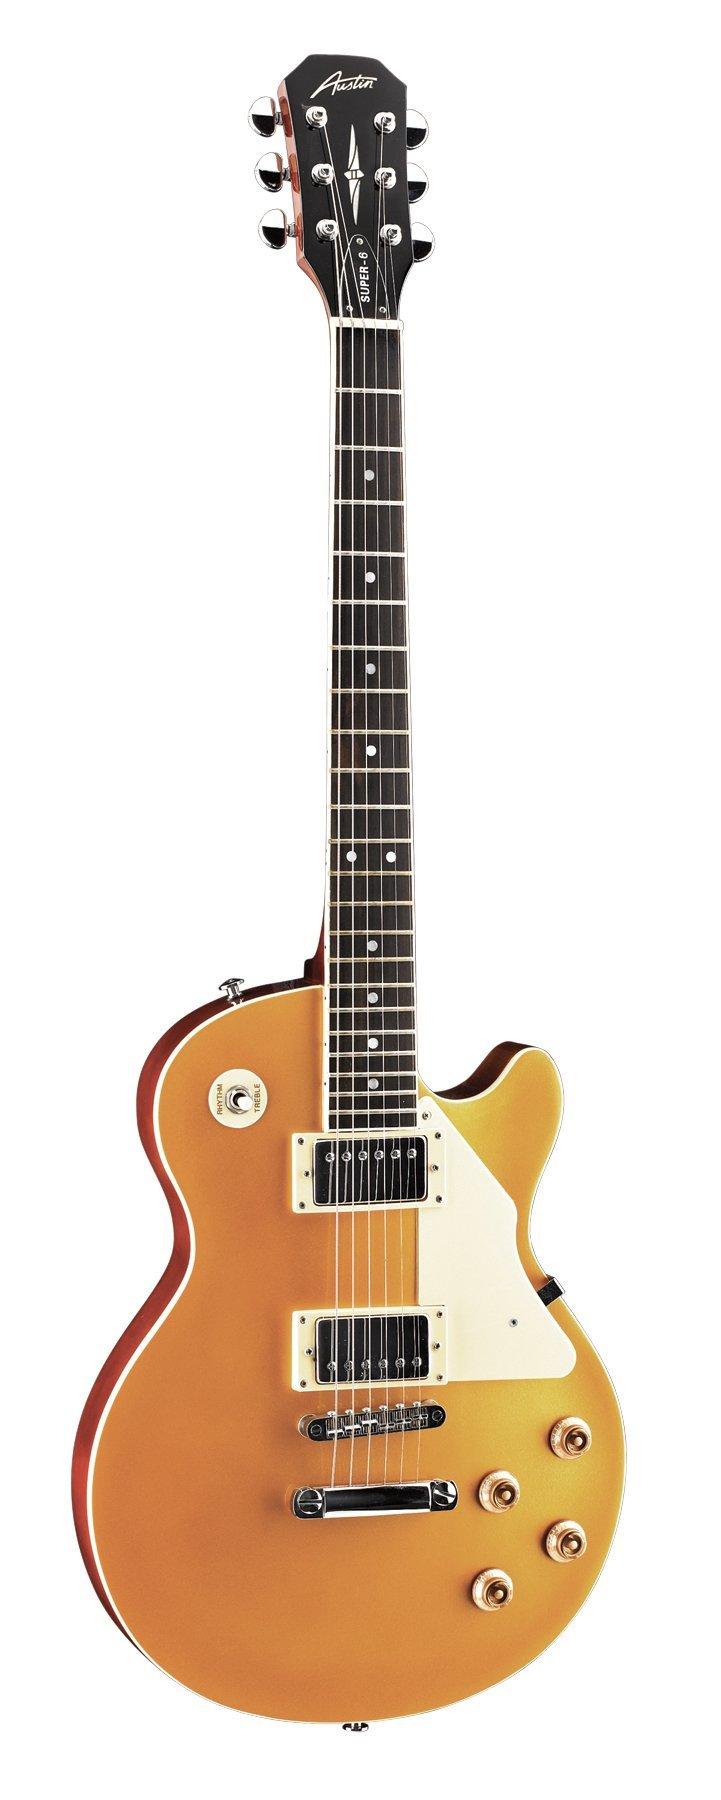 Cheap Austin Guitars AS6PGT Super-6 Series Electric Guitar Black Friday & Cyber Monday 2019